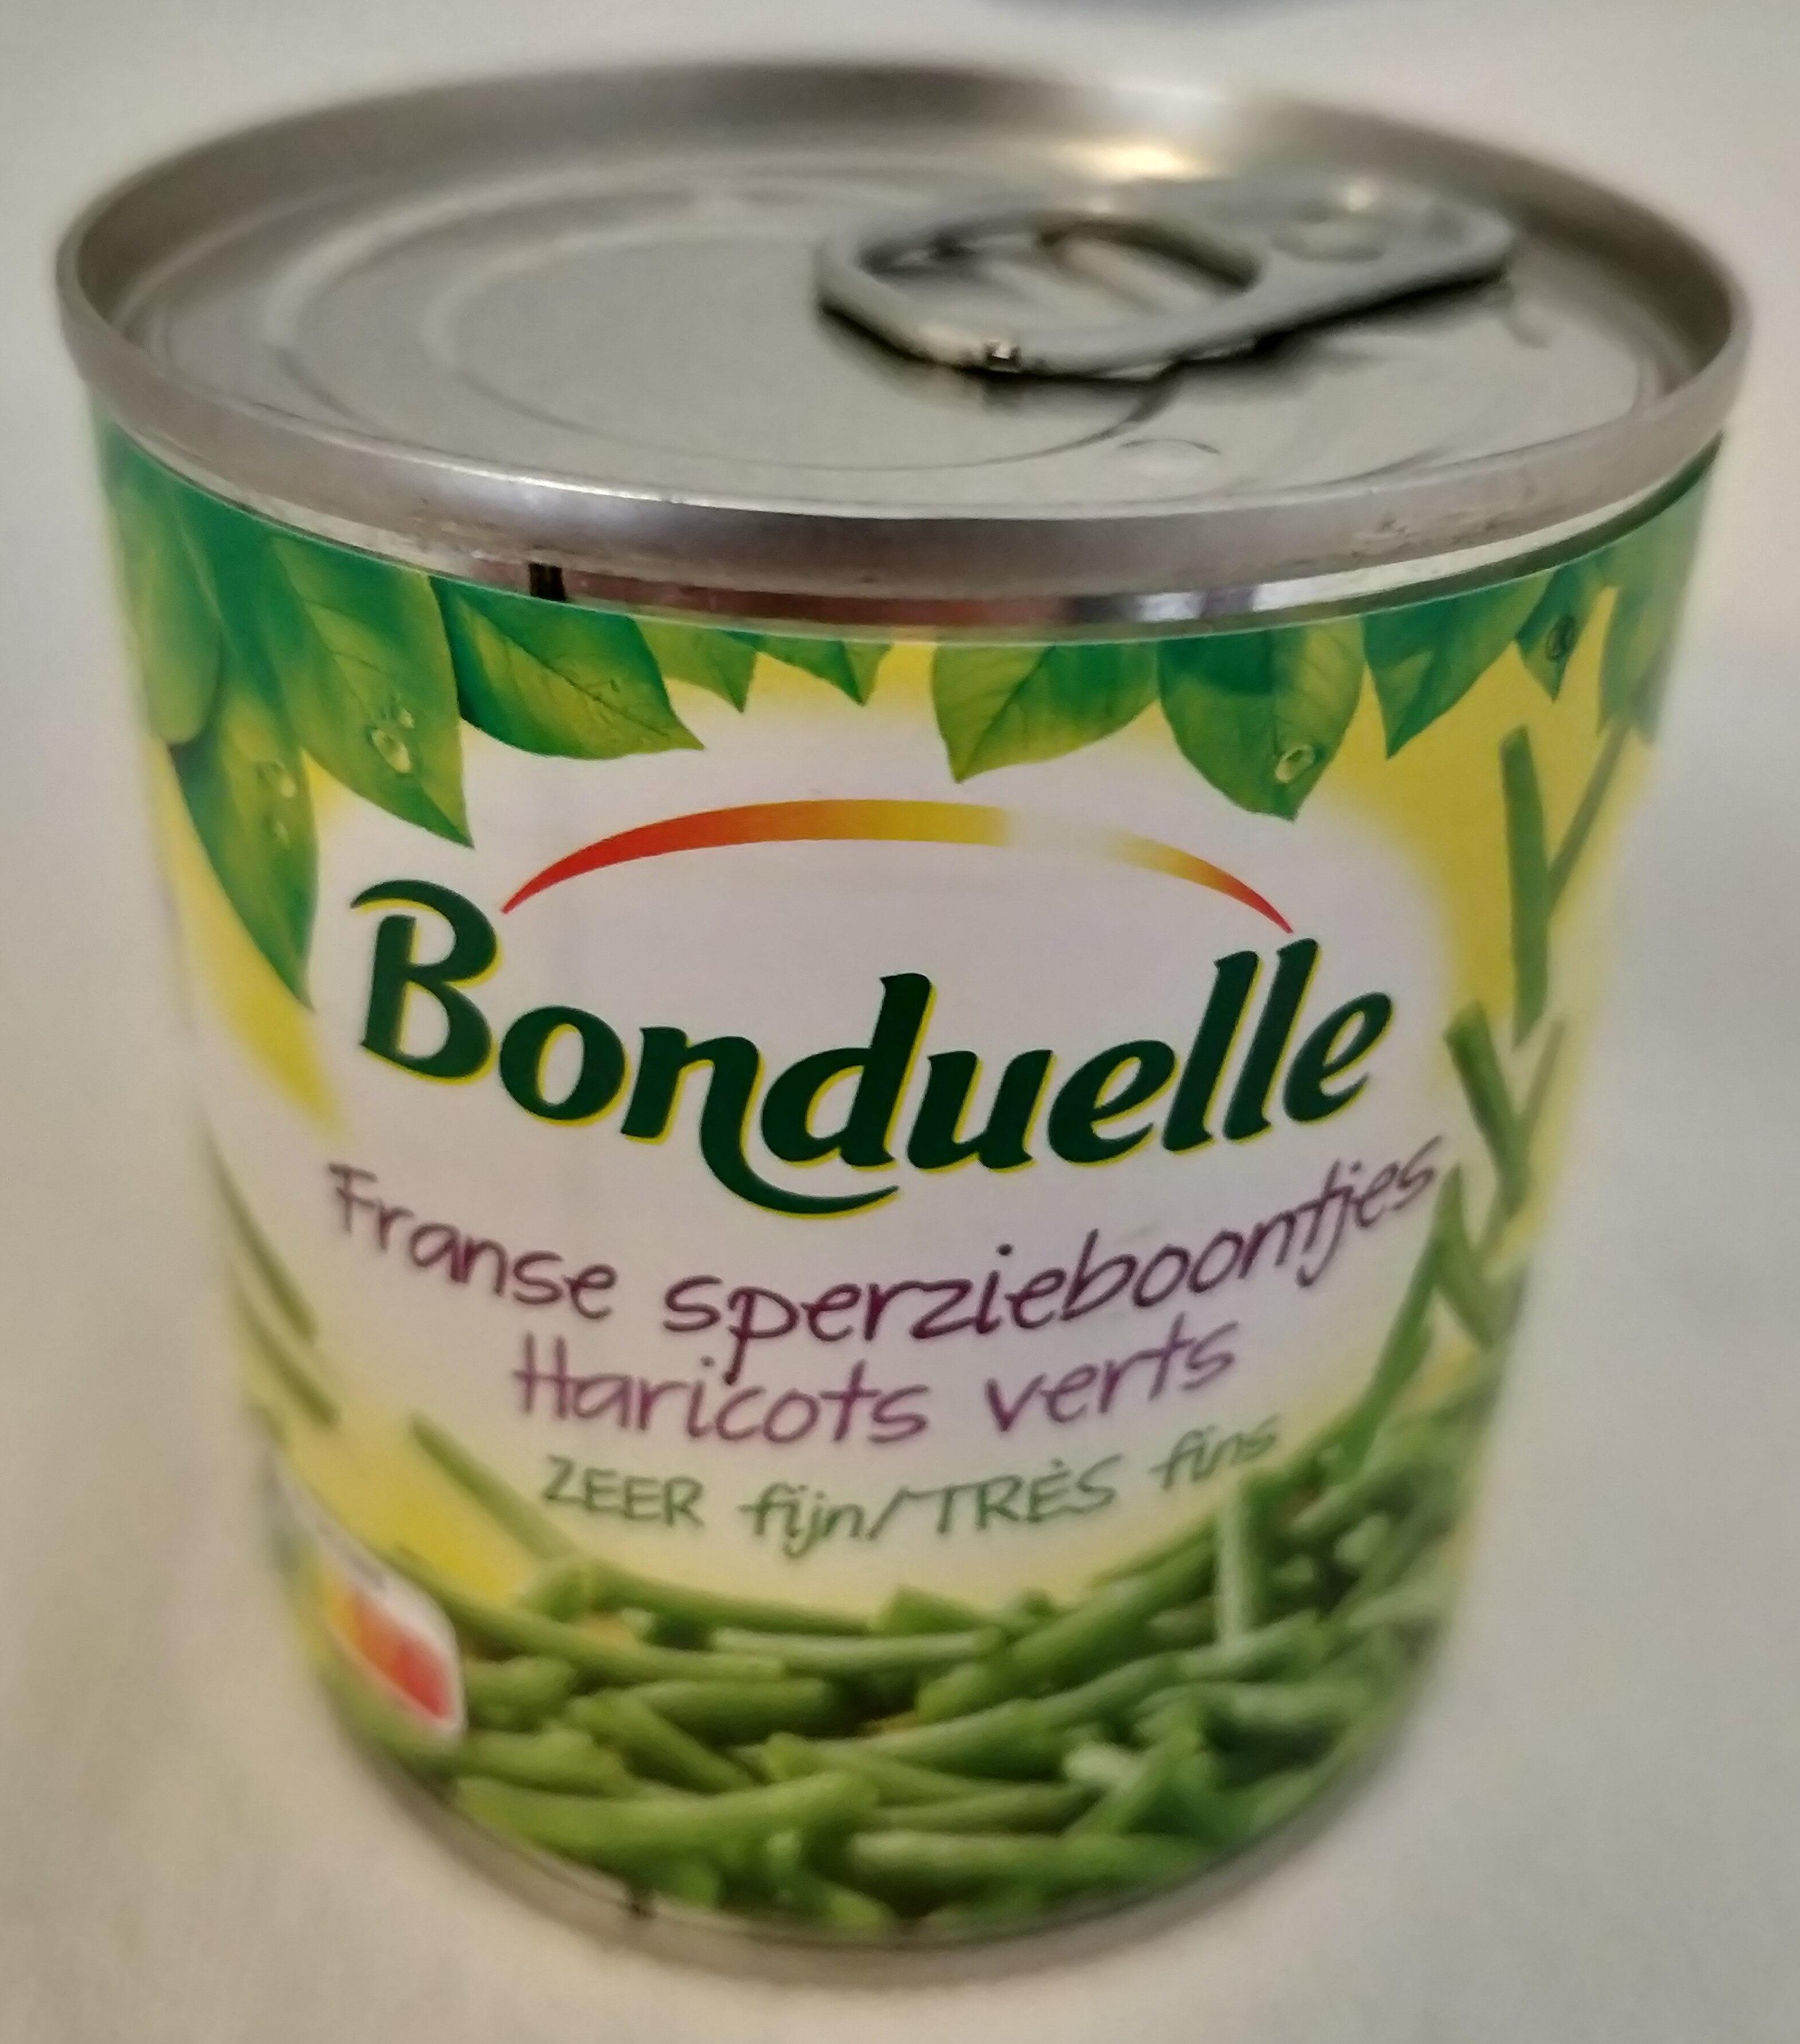 Franse sperzieboontjes - Product - nl